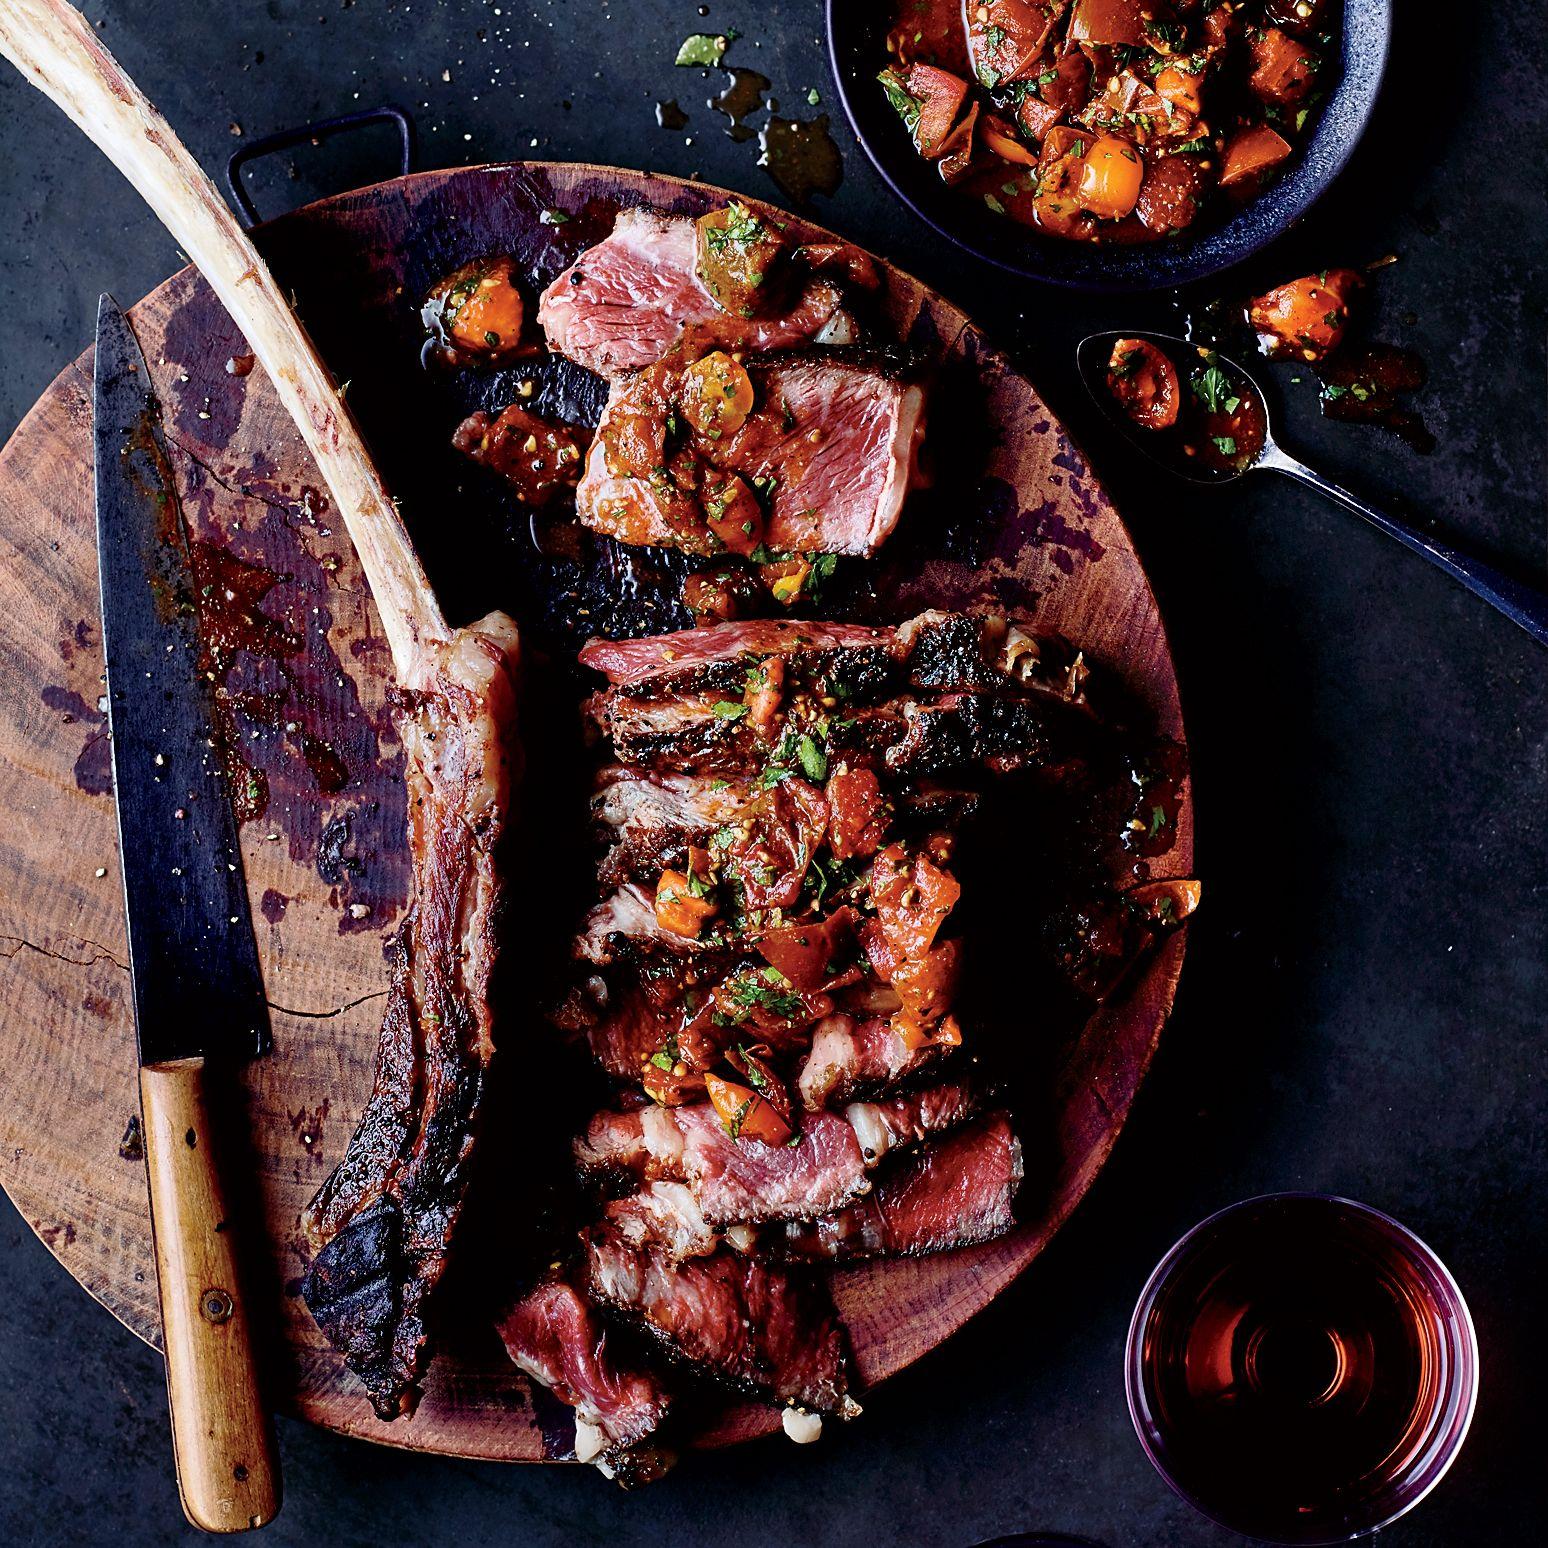 Tomahawk, steak: recipes for juicy meat